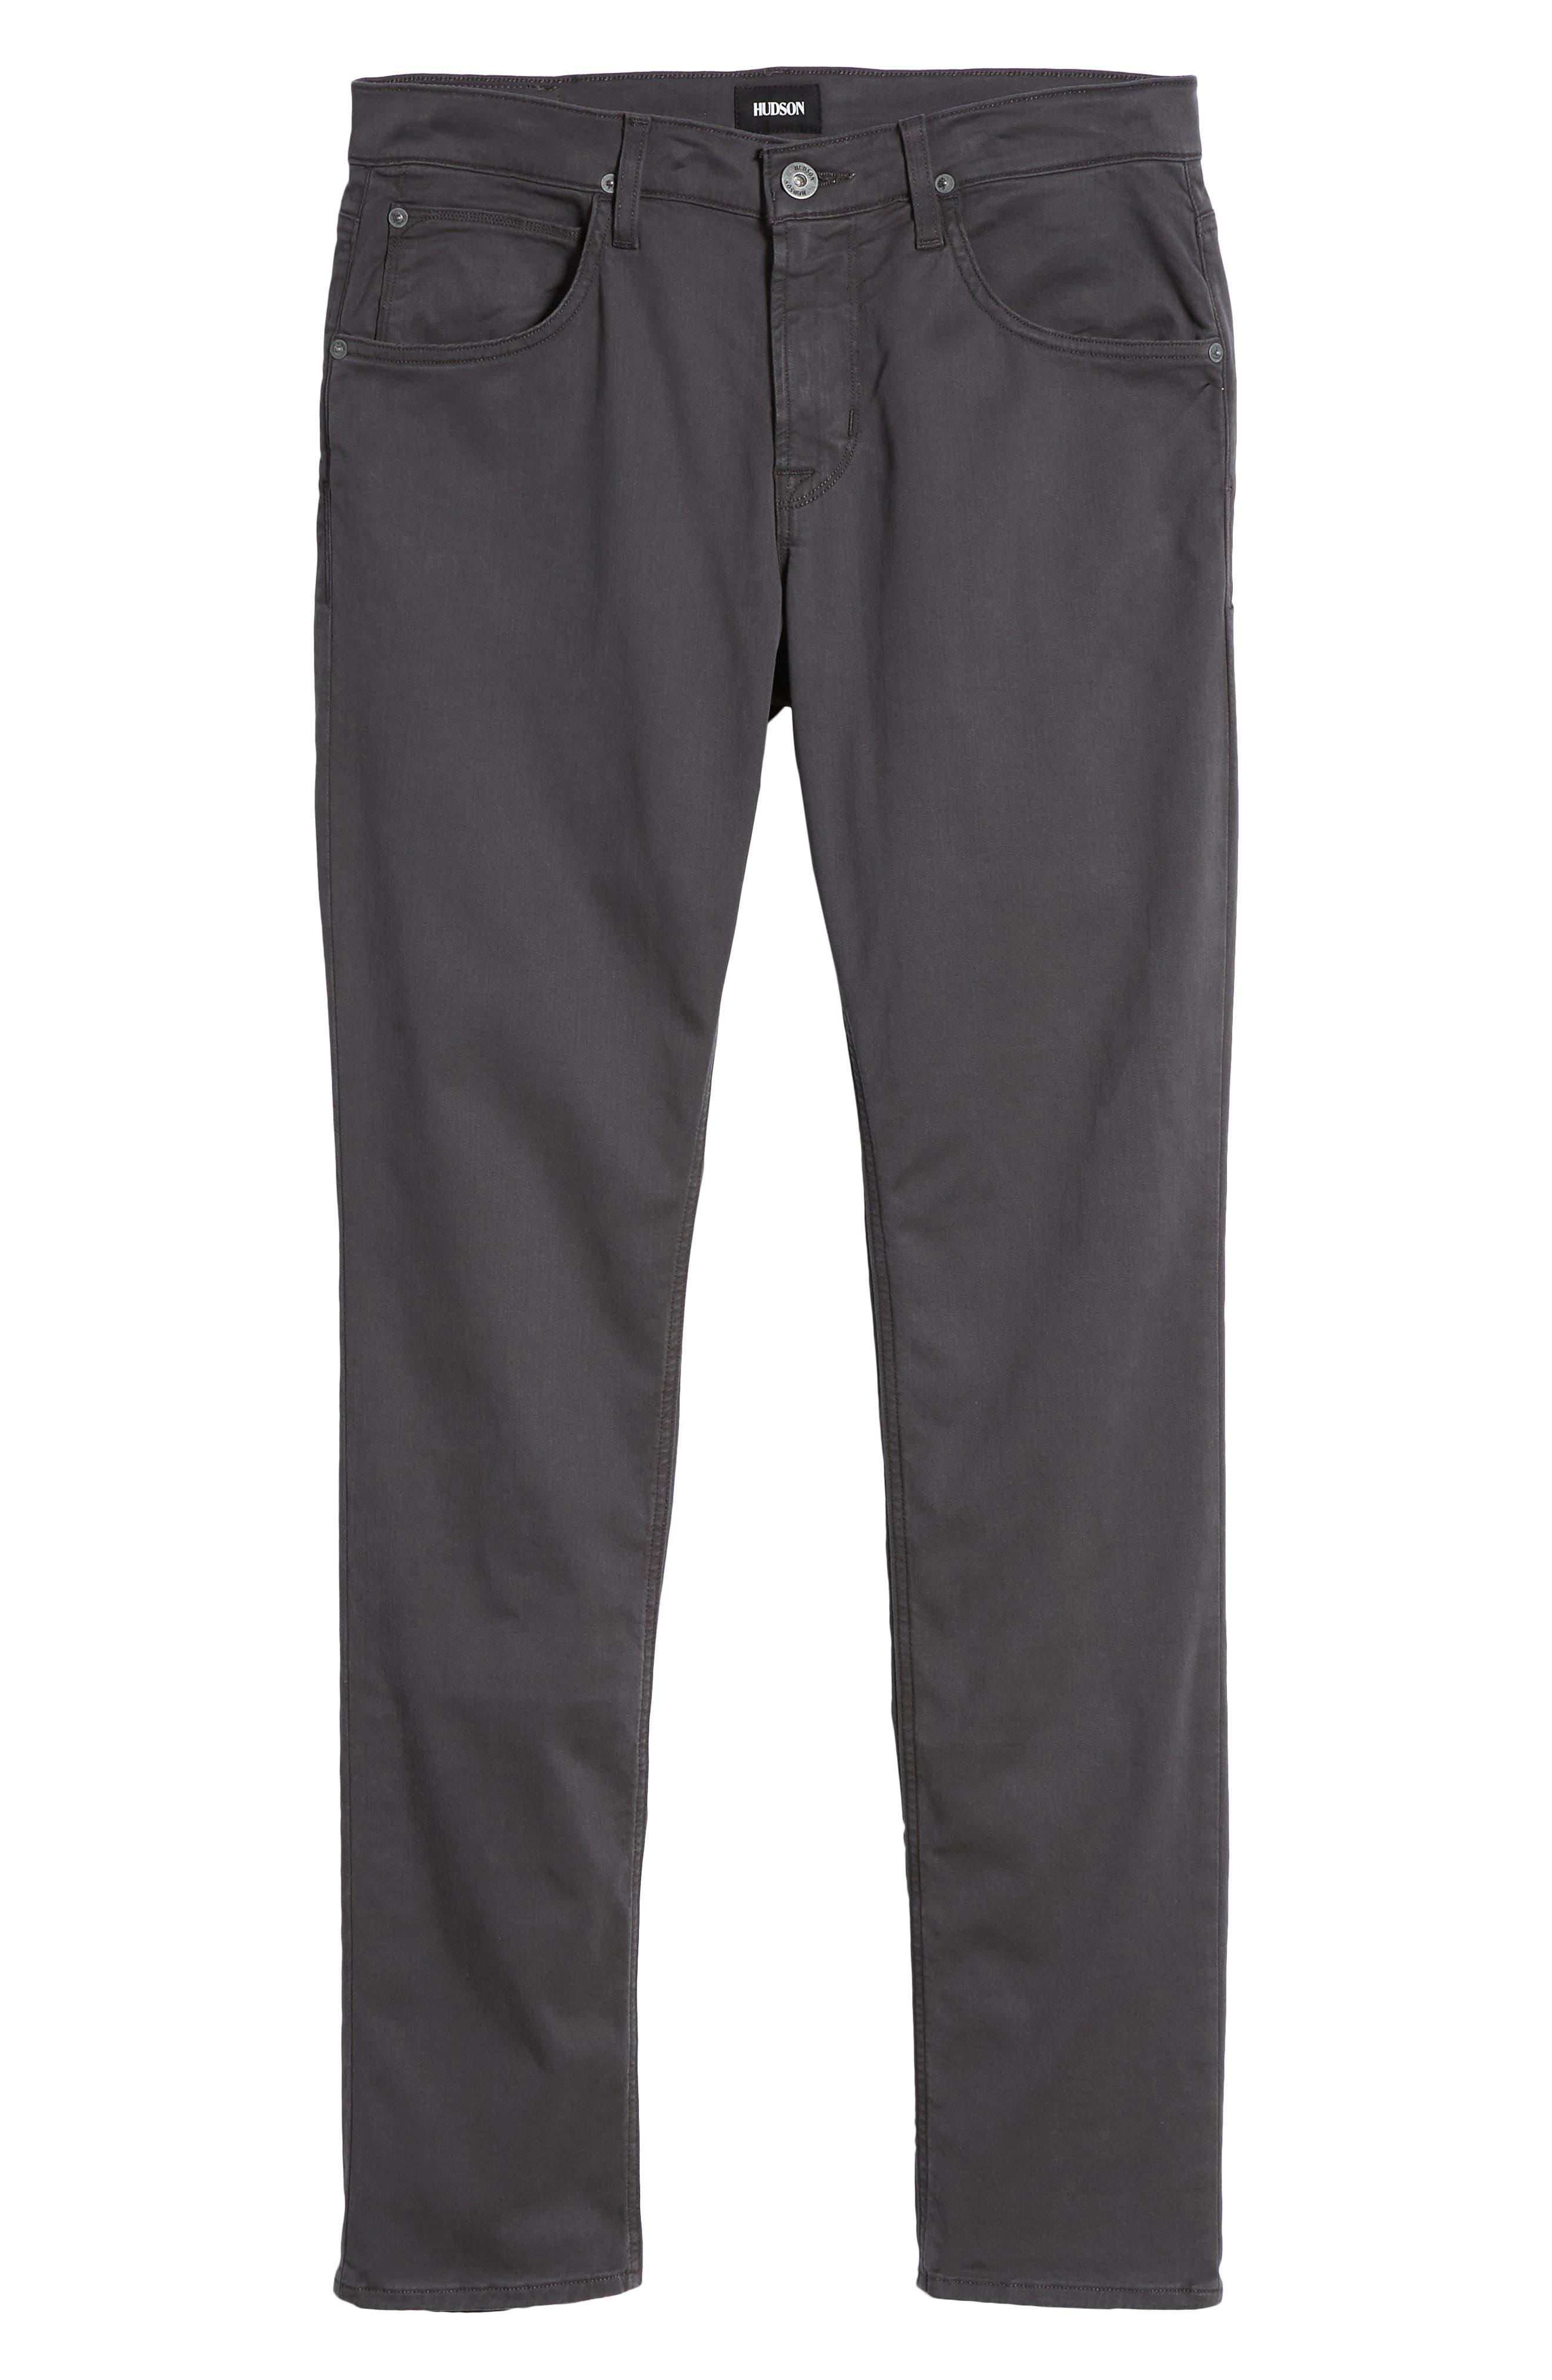 Blake Slim Fit Jeans,                             Alternate thumbnail 6, color,                             Metal